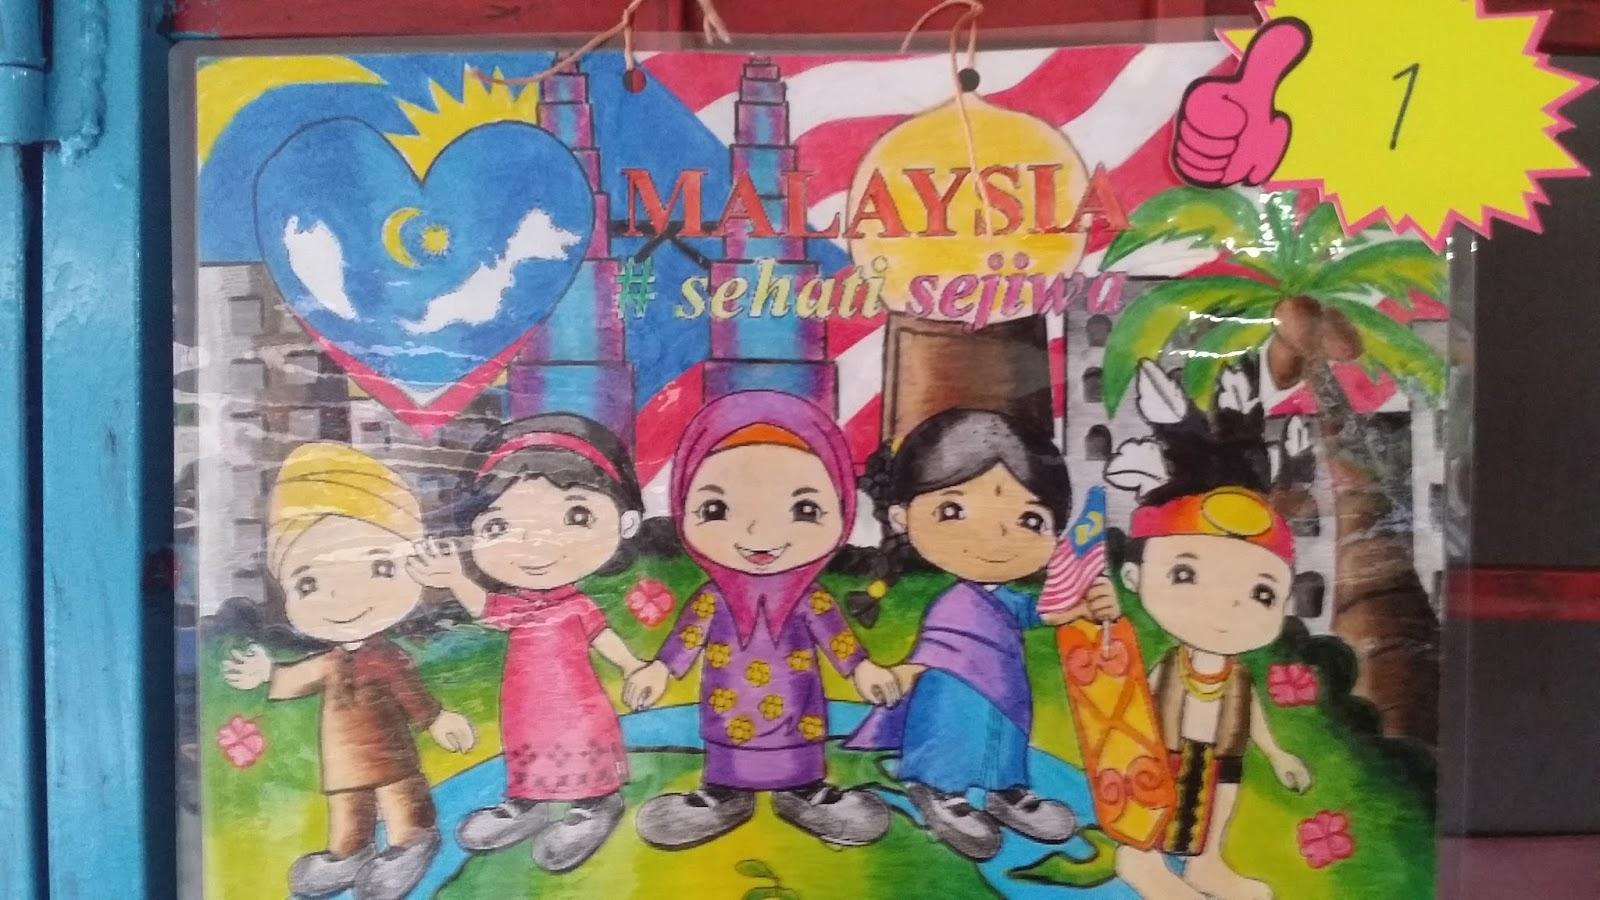 Panitia psv dsv sk parit kasan september 2016 for Mural 1 malaysia